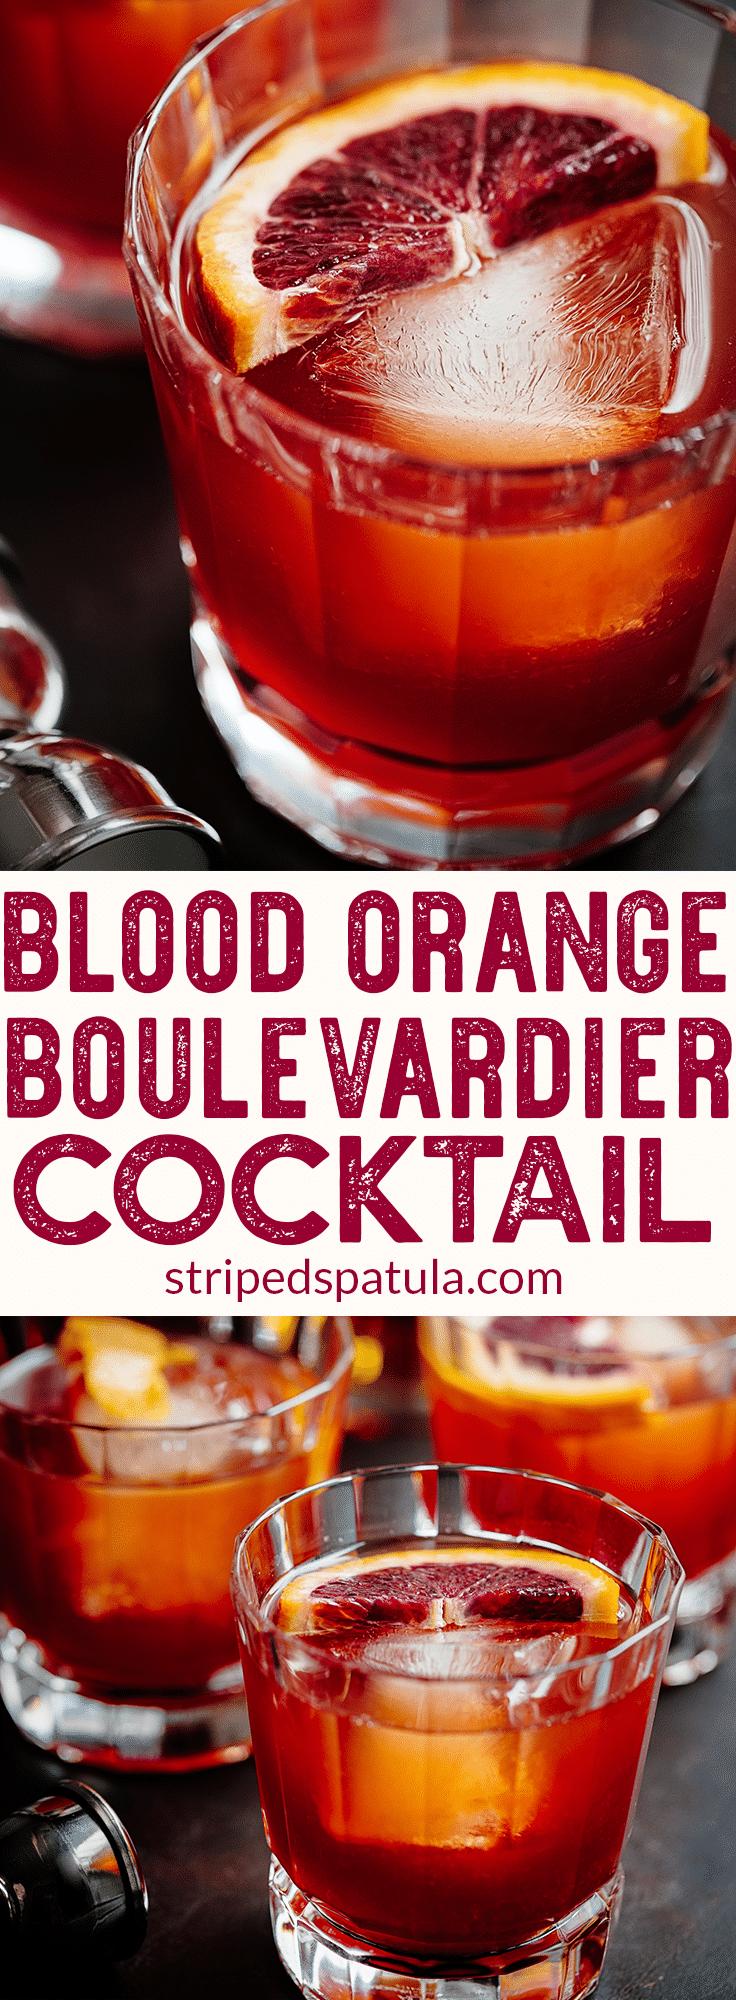 Blood Orange Boulevardier Cocktail | Campari Drinks | Campari Cocktail | Bourbon Cocktails | Bourbon Drinks | Whiskey Cocktails | Cocktail Recipes | Alcoholic Drinks | #drinkrecipes #alcohol #cocktails #cocktailrecipe #bourbon #stripedspatula